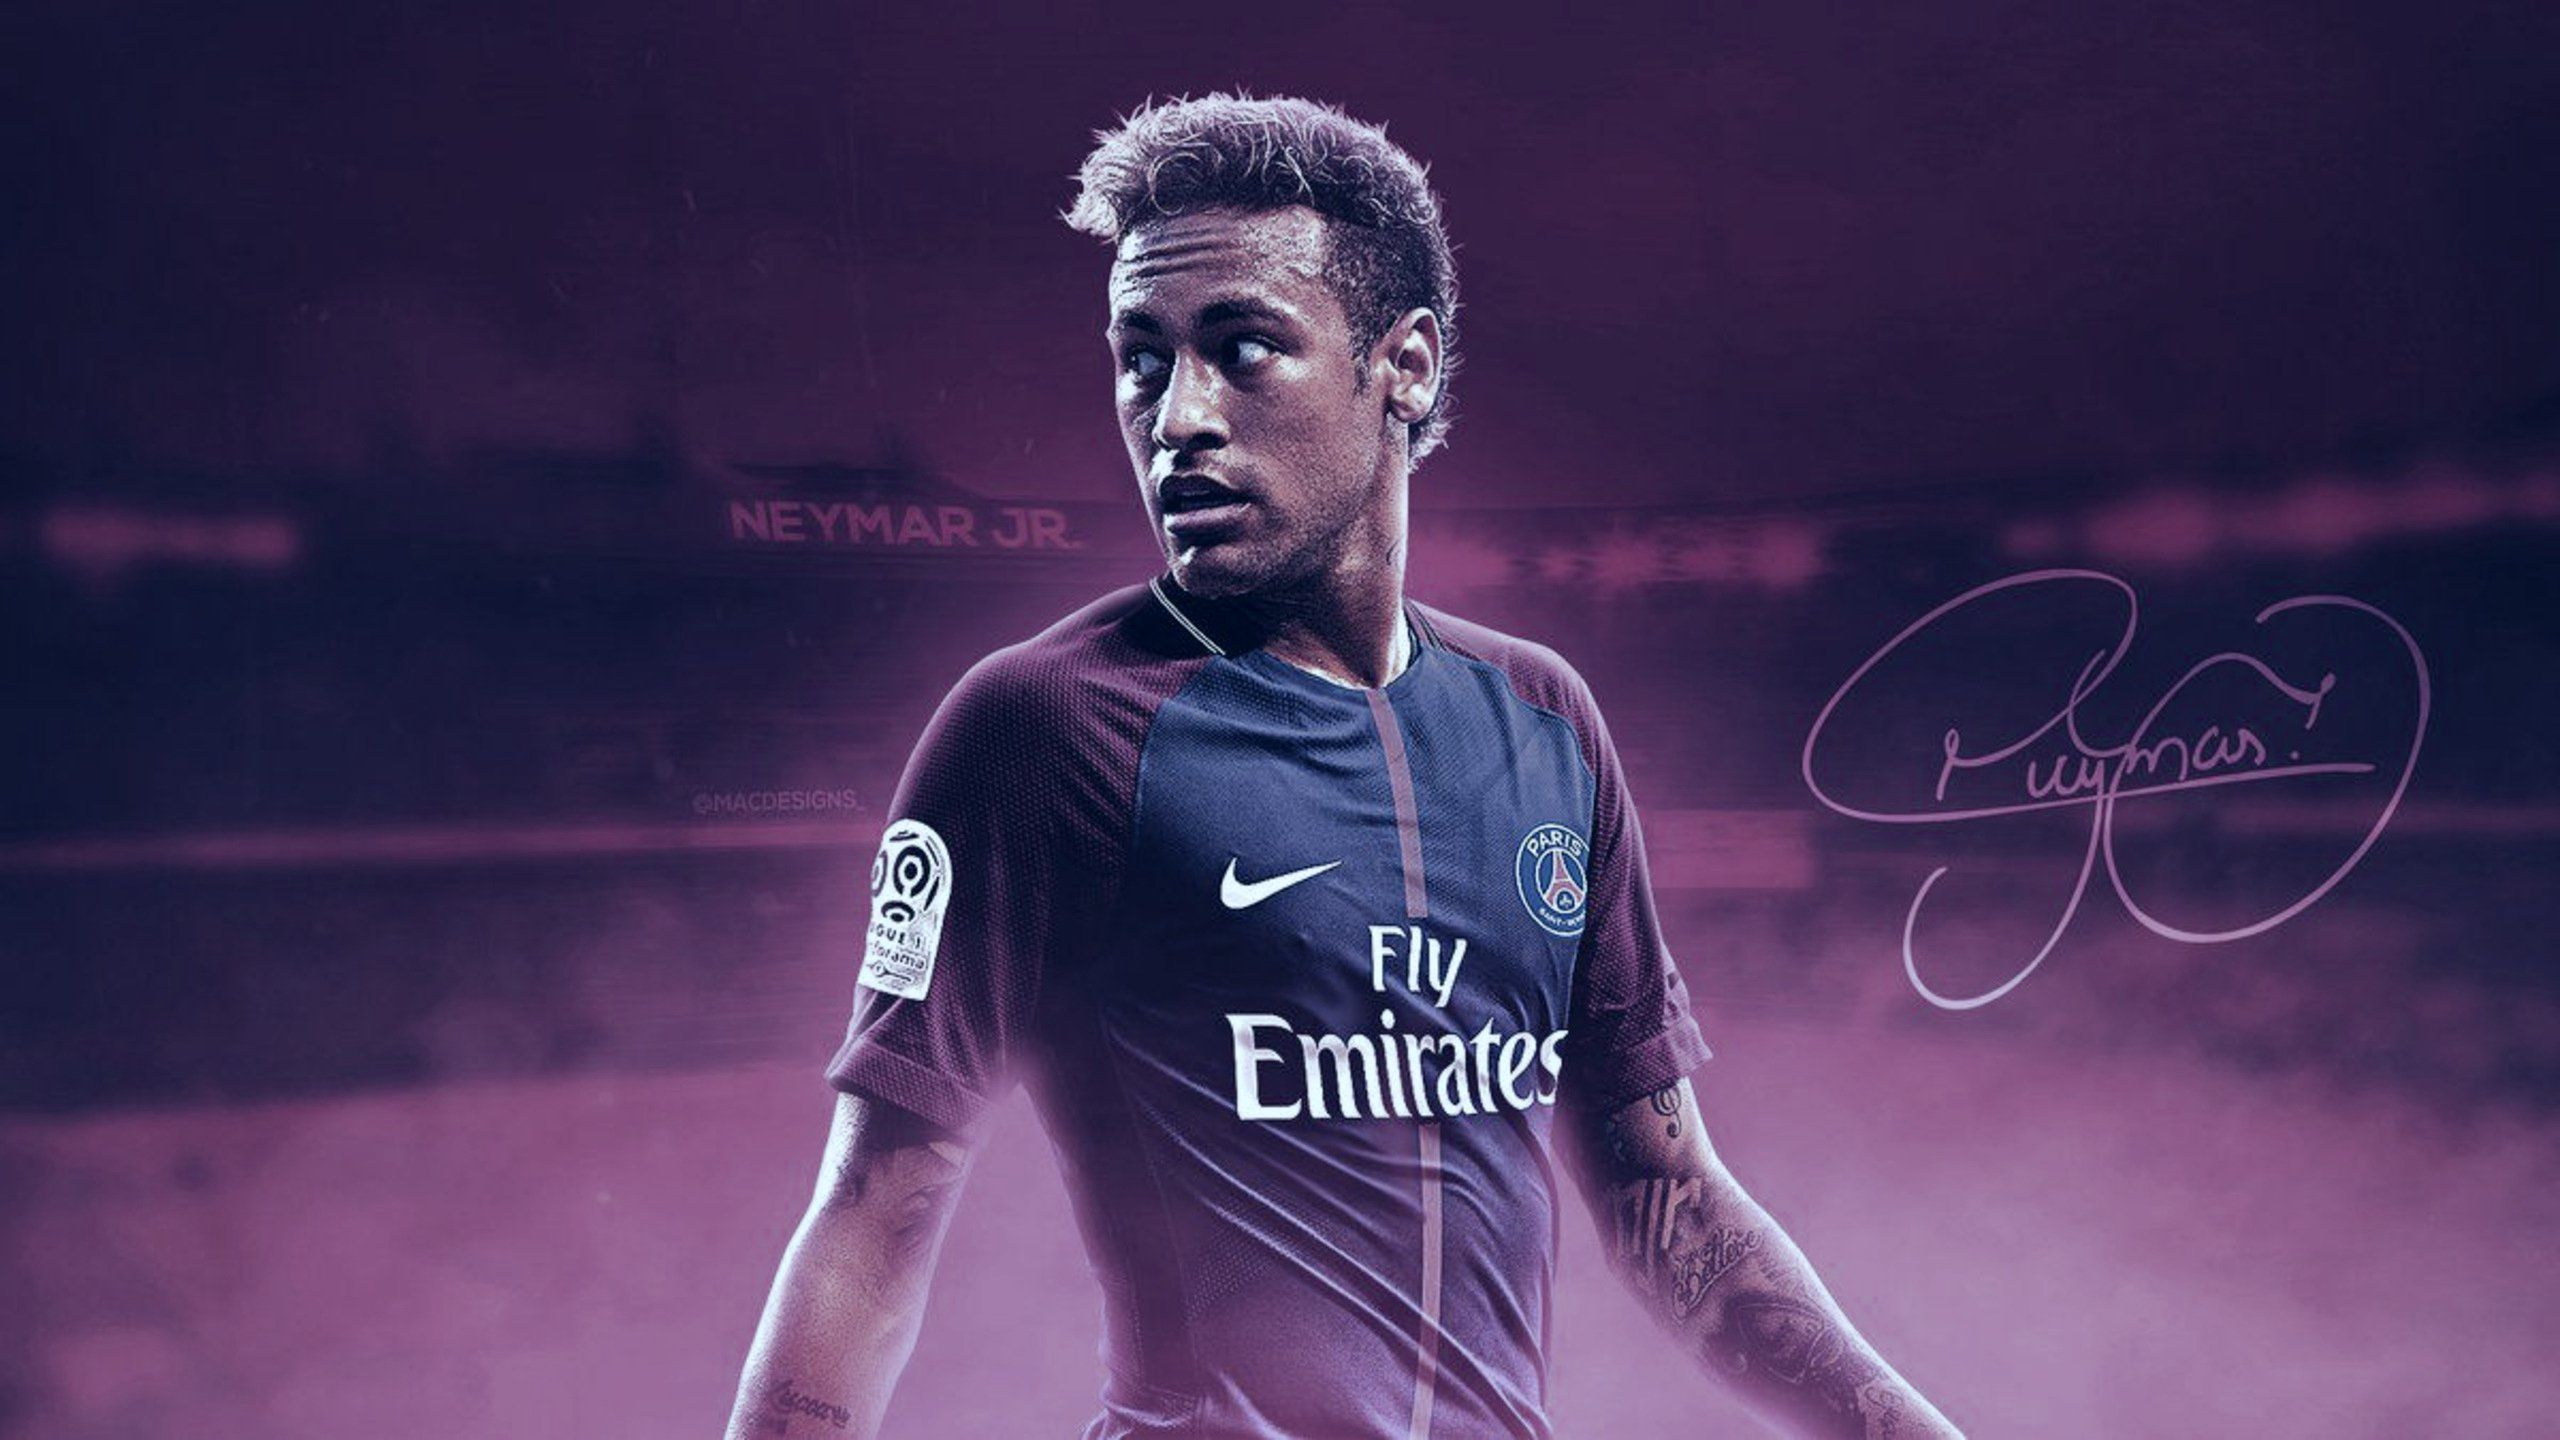 THE BEST 24 NEYMAR HD WALLPAPER PHOTOS IN 2020 Neymar psg 2560x1440